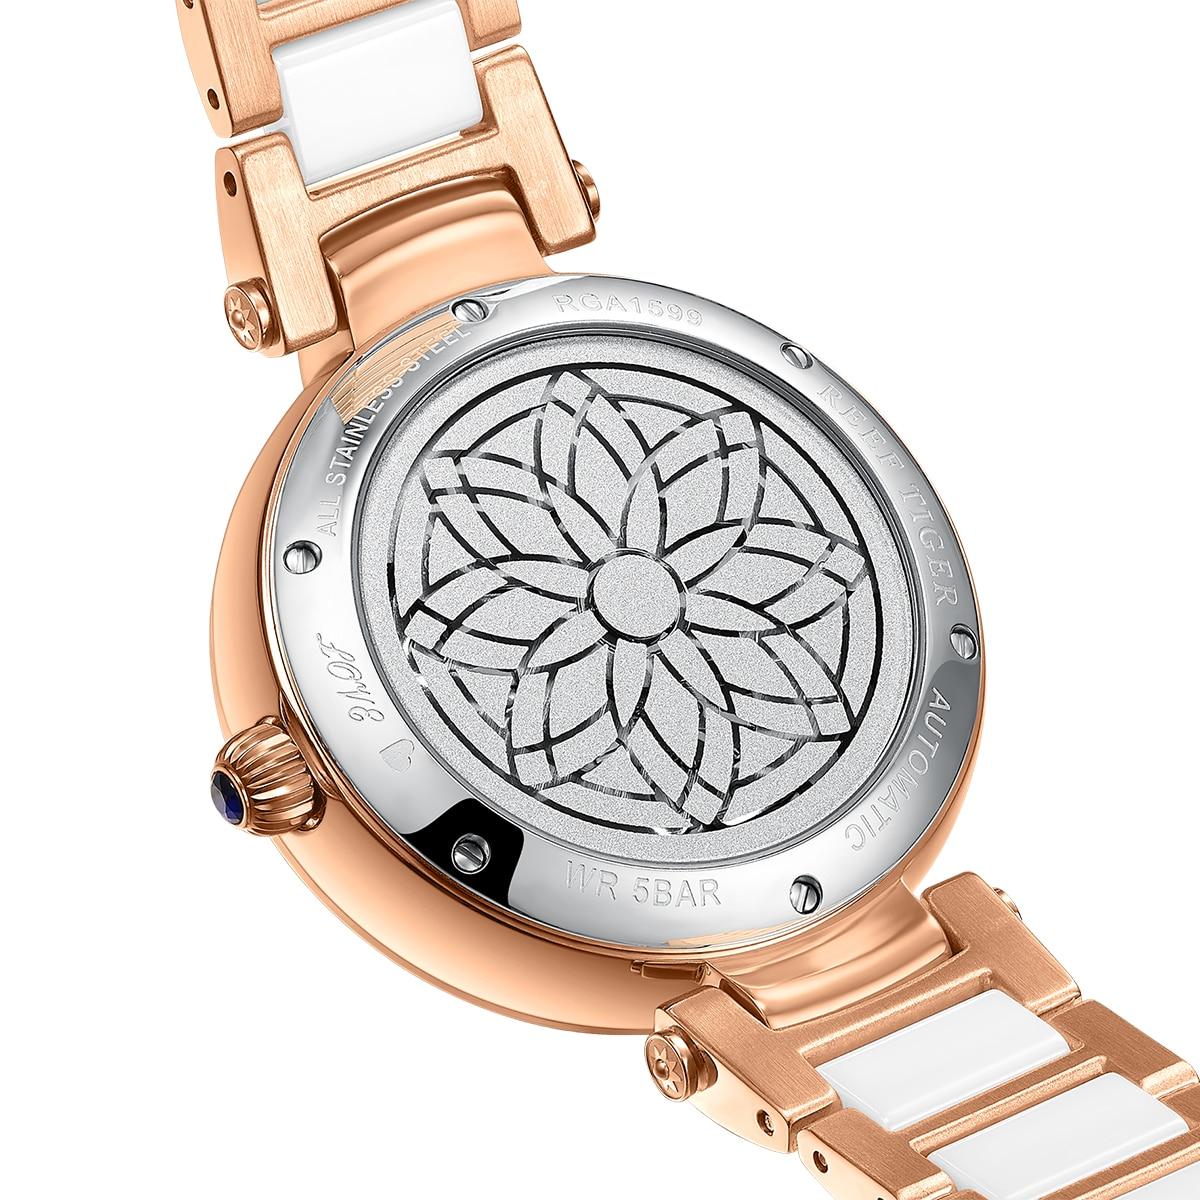 Reef Tiger/RT Fashion Lily Women Watch Rose Gold Diamonds Bezel Lady Automatic Watches Relogio Feminino RGA1599 enlarge